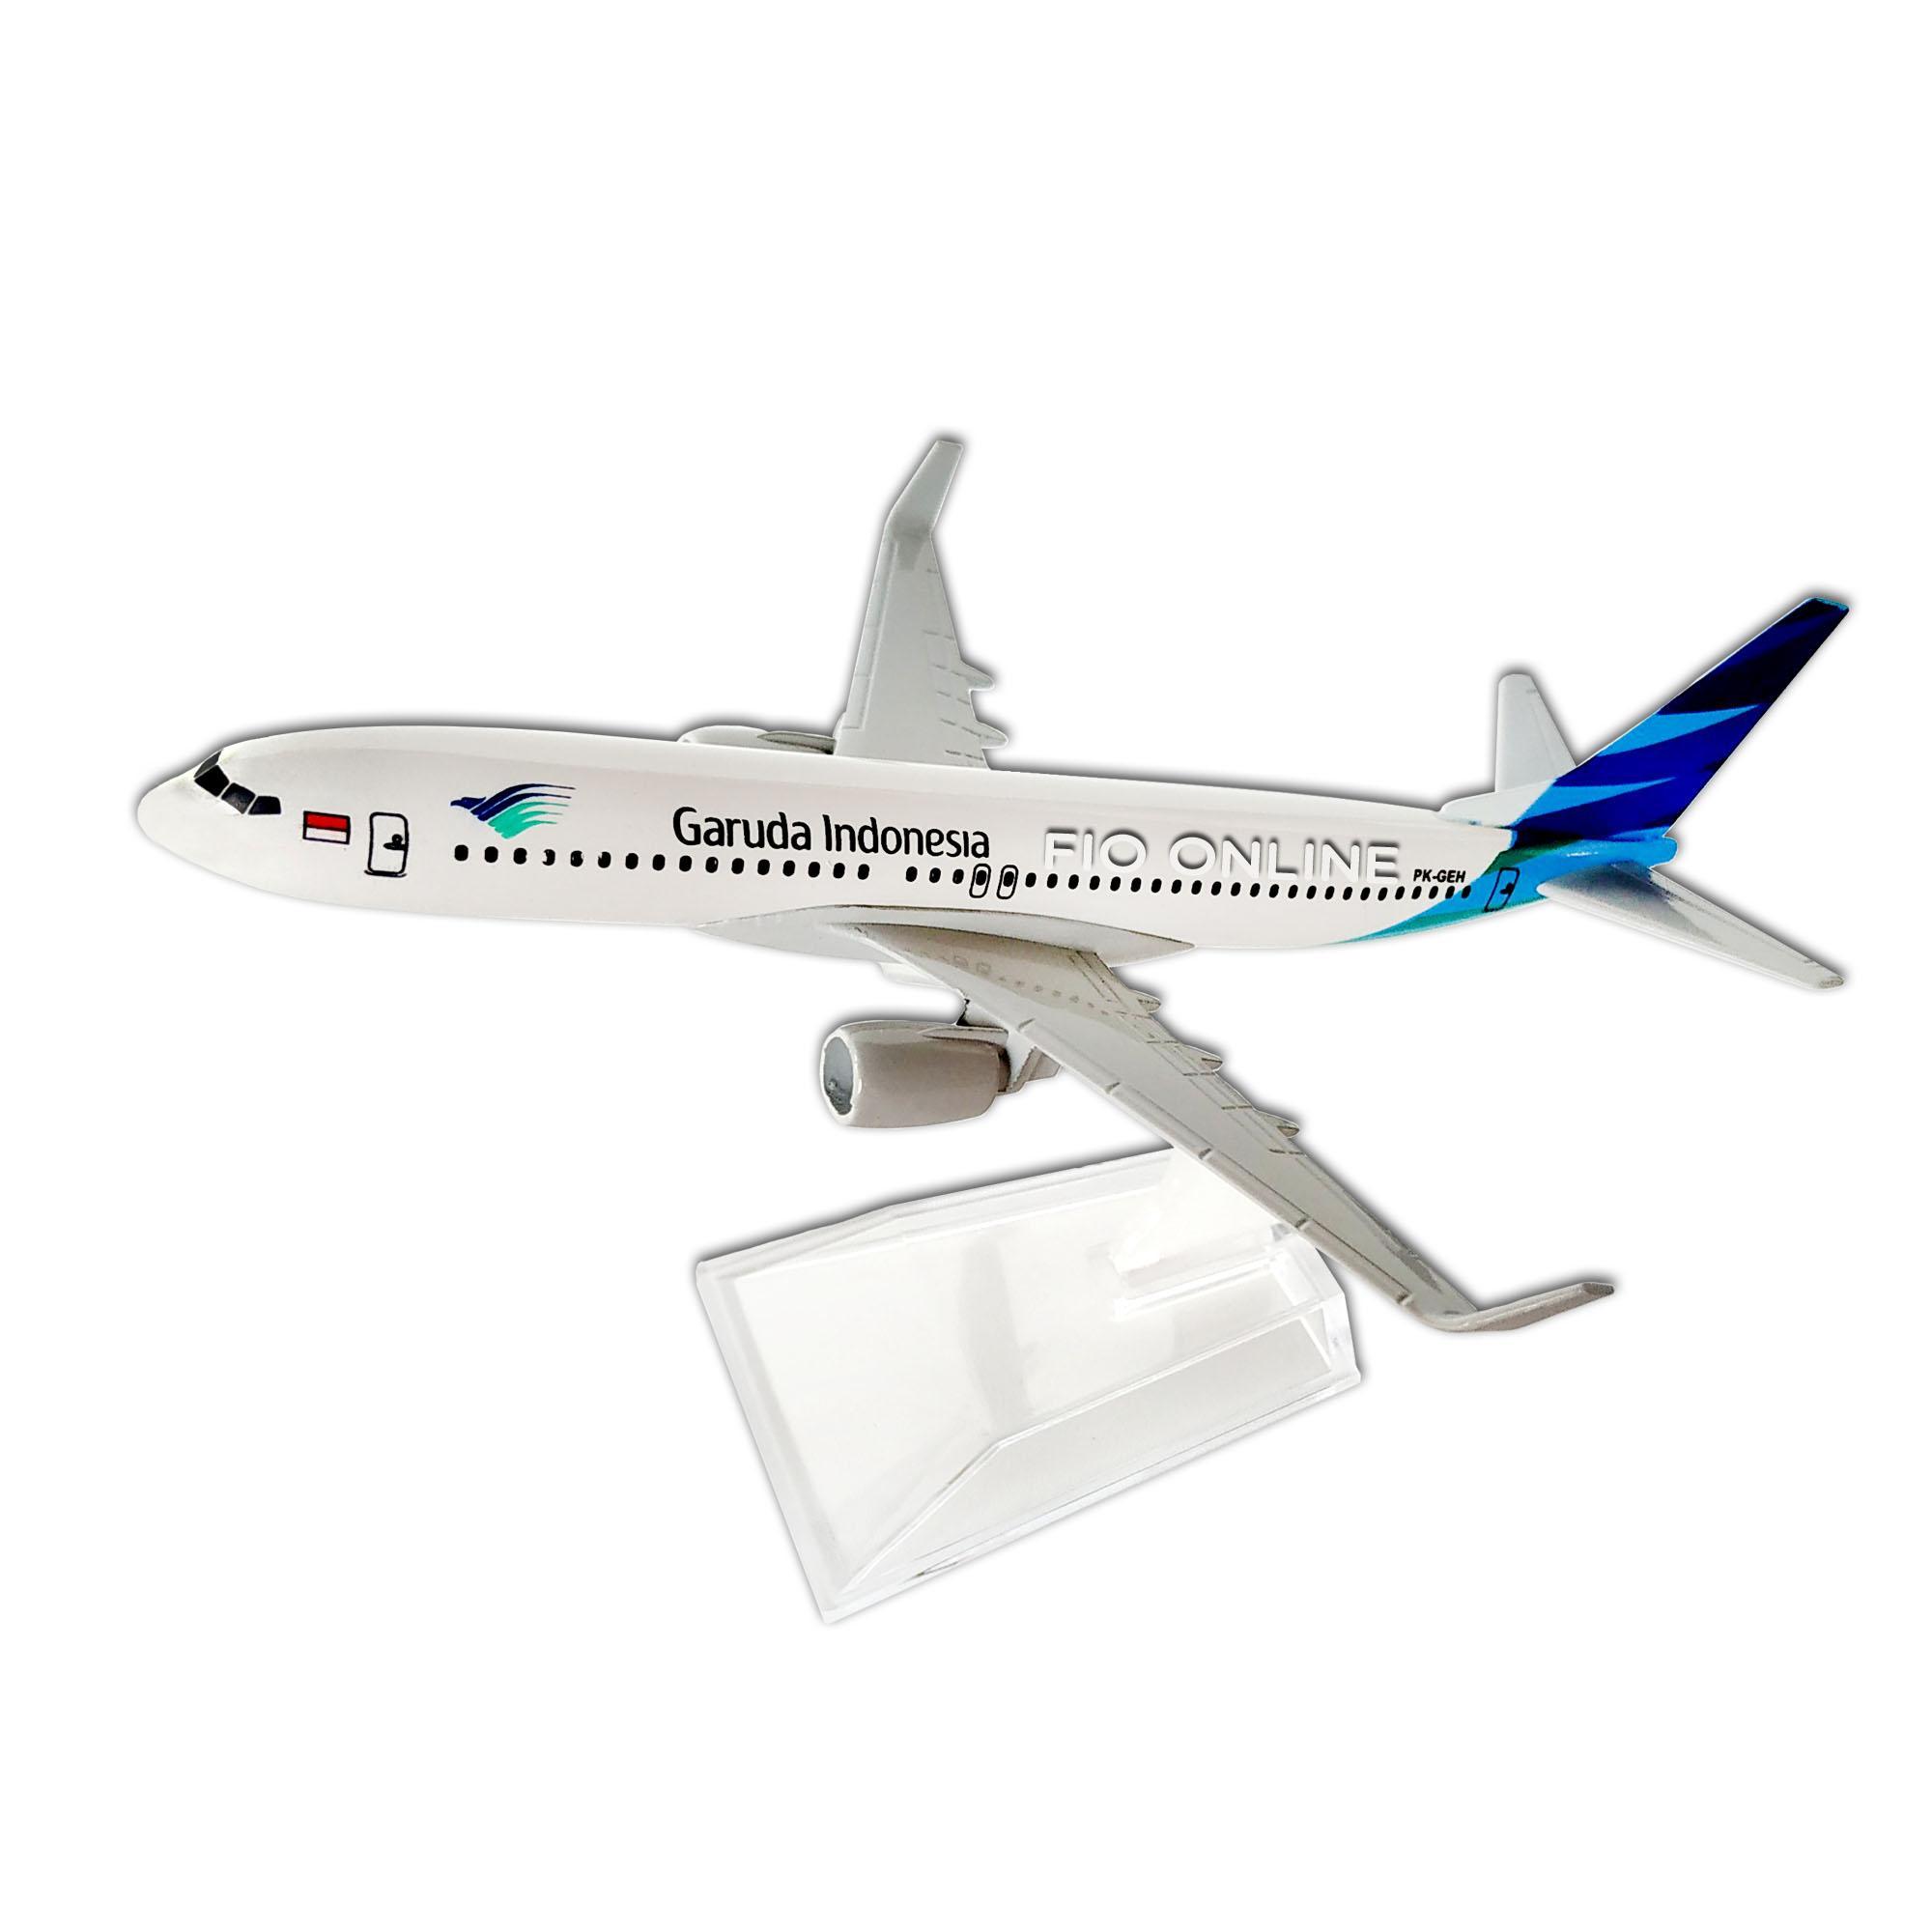 Kelebihan Miniatur Pesawat B737 800ng Garuda Terkini Daftar Harga Diecast Citilink Fio Online Souvenir Model Aircraft Indonesia Boeing 737